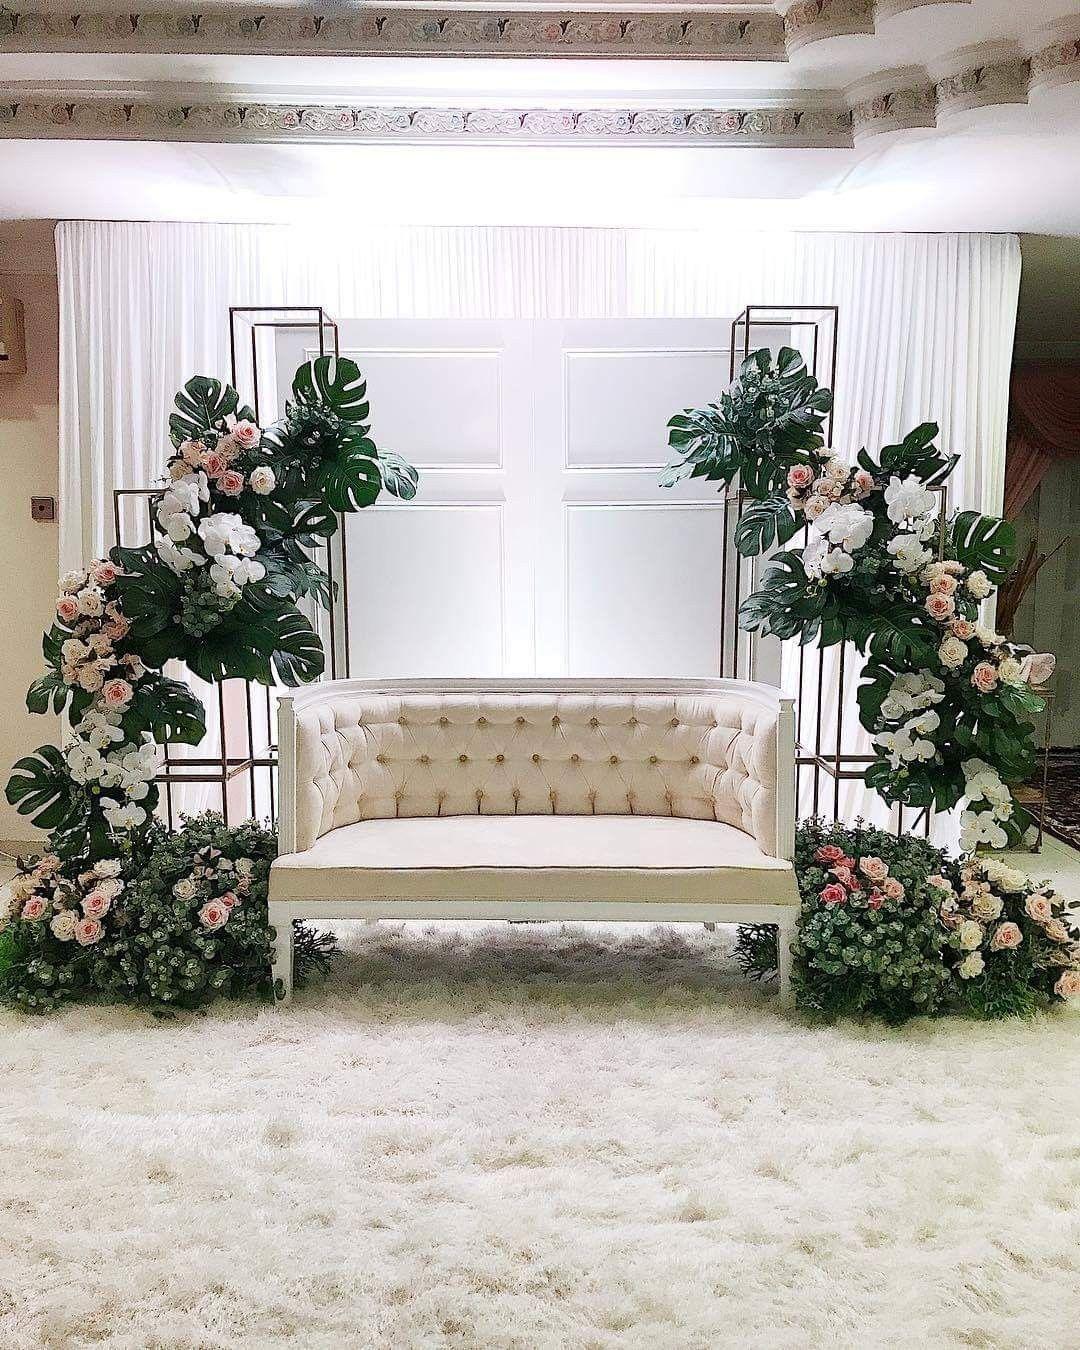 Pin On Futuro Wedding Stage Decorations Wedding Decor Elegant Wedding Backdrop Decorations